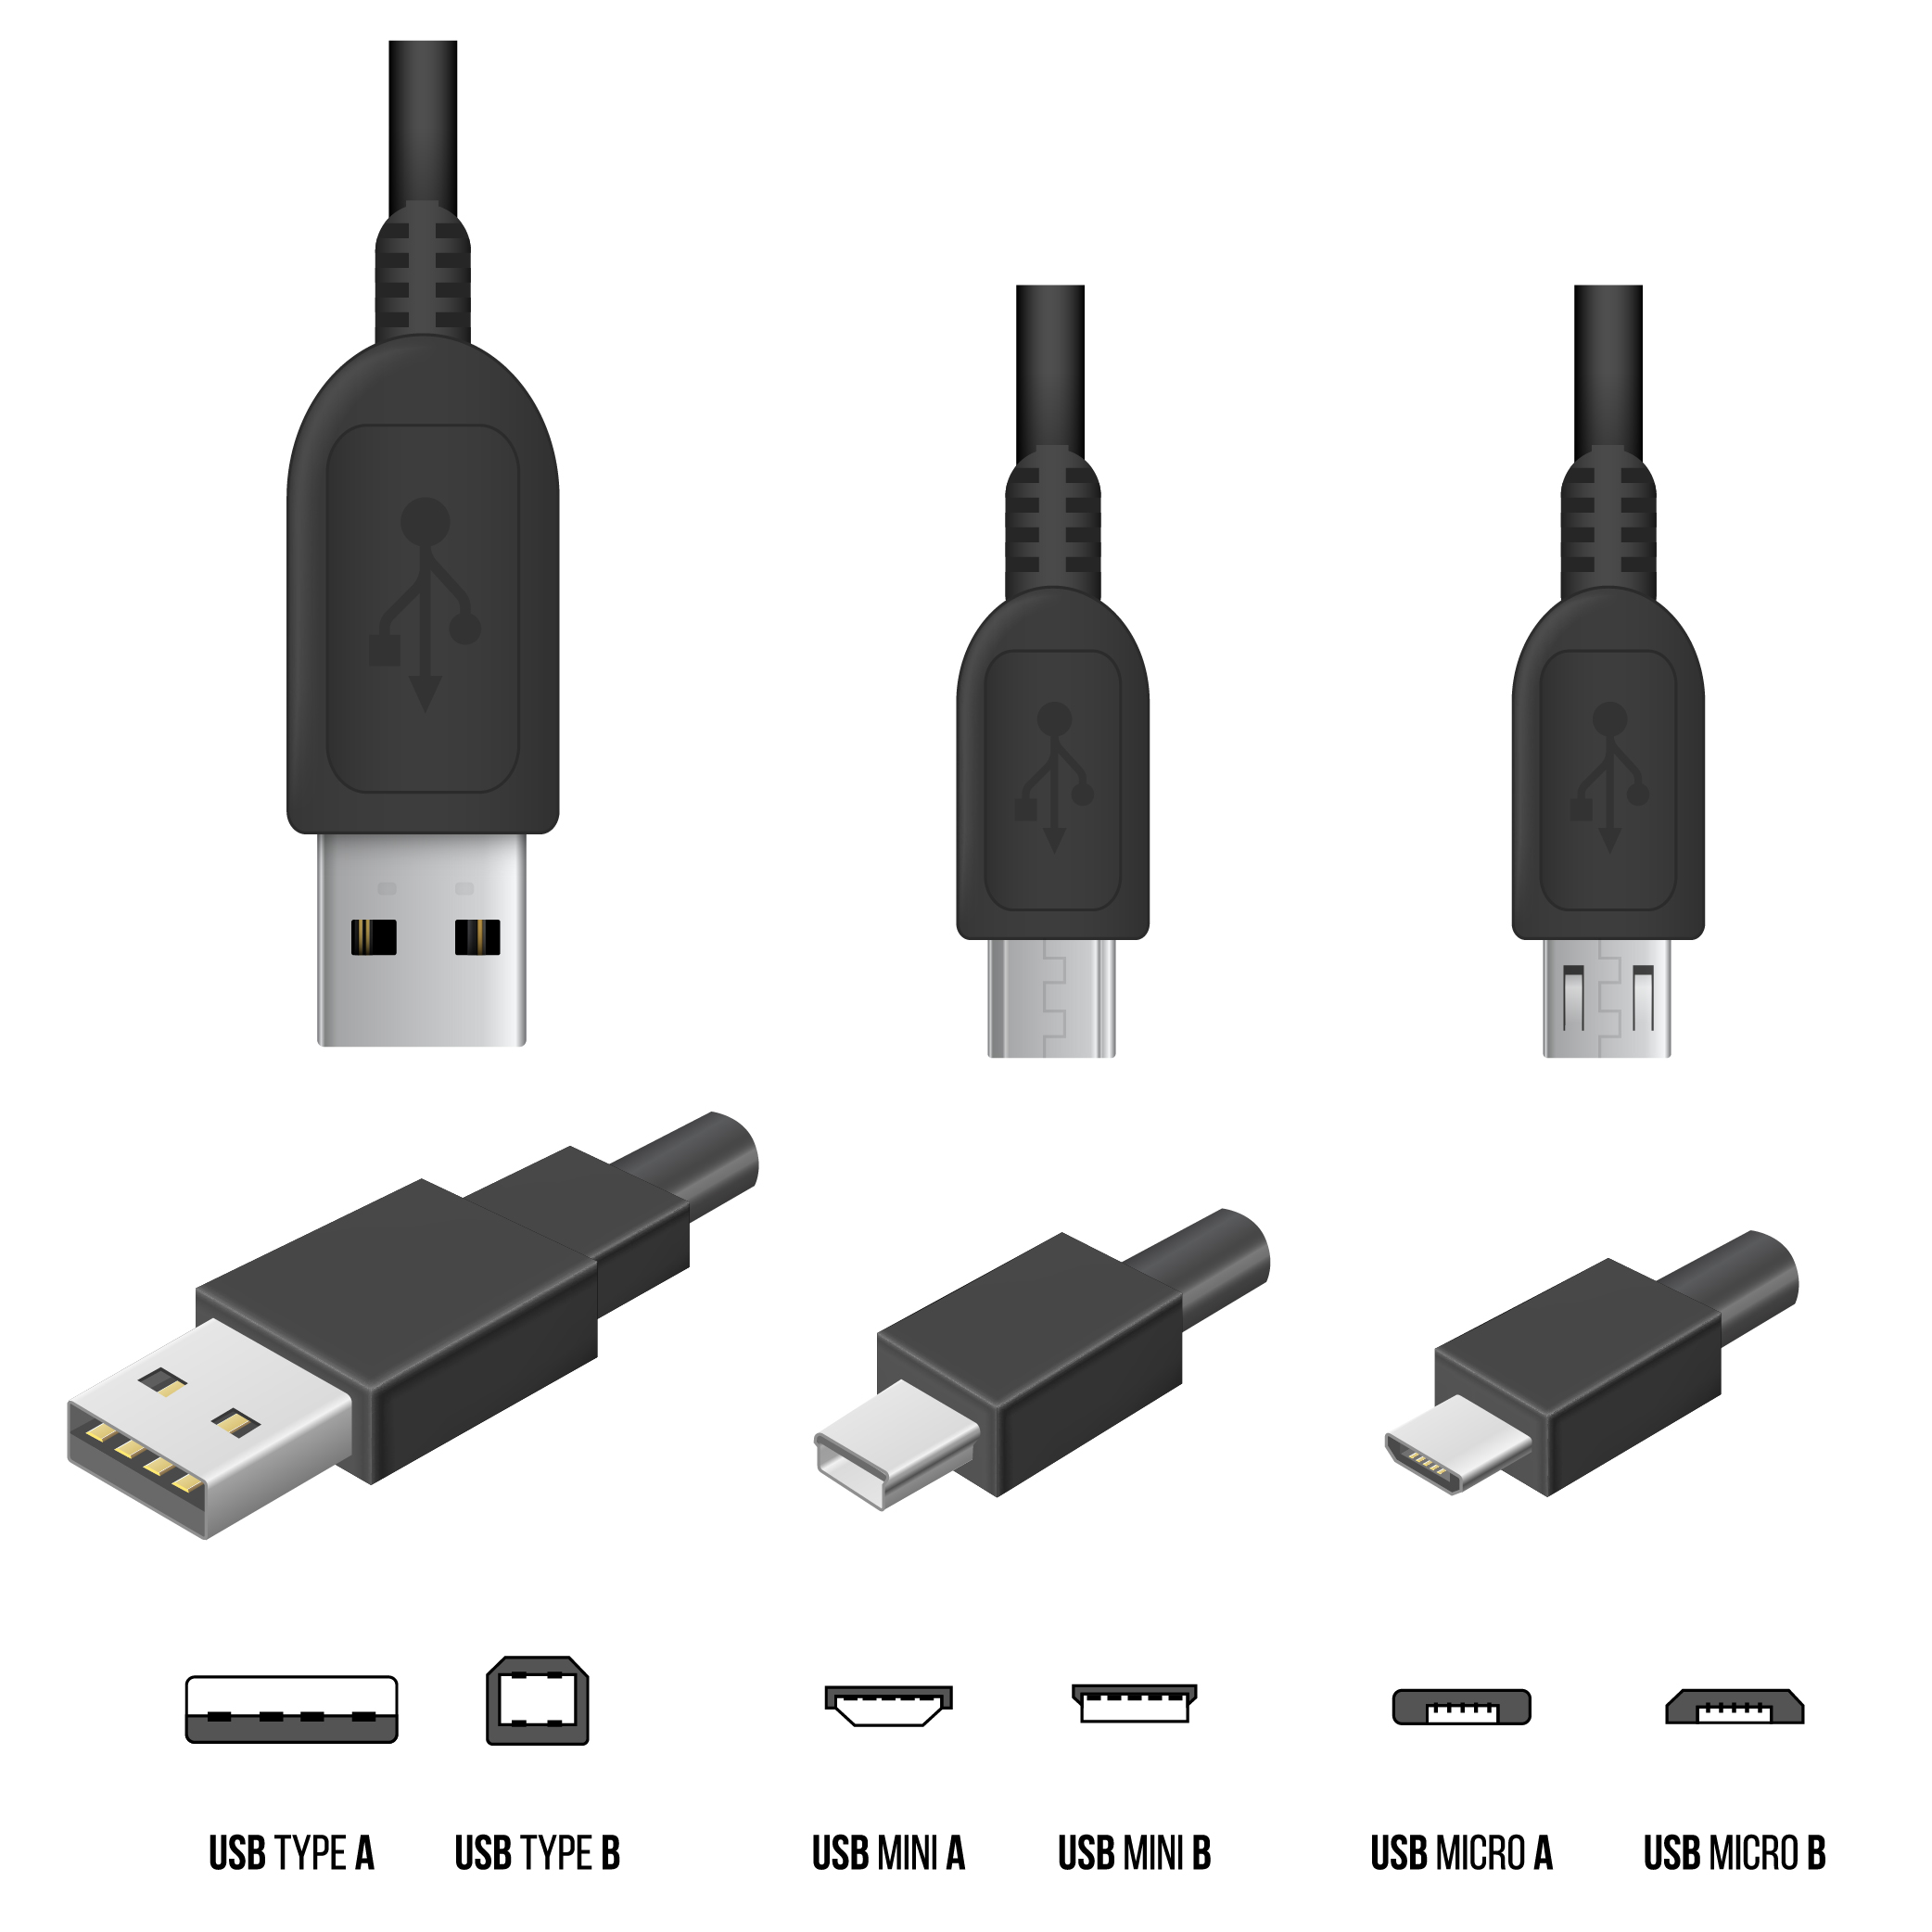 USB Type A, USB Type B, USB Mini A, USB Mini B, USB Micro A, USB Micro B connectors